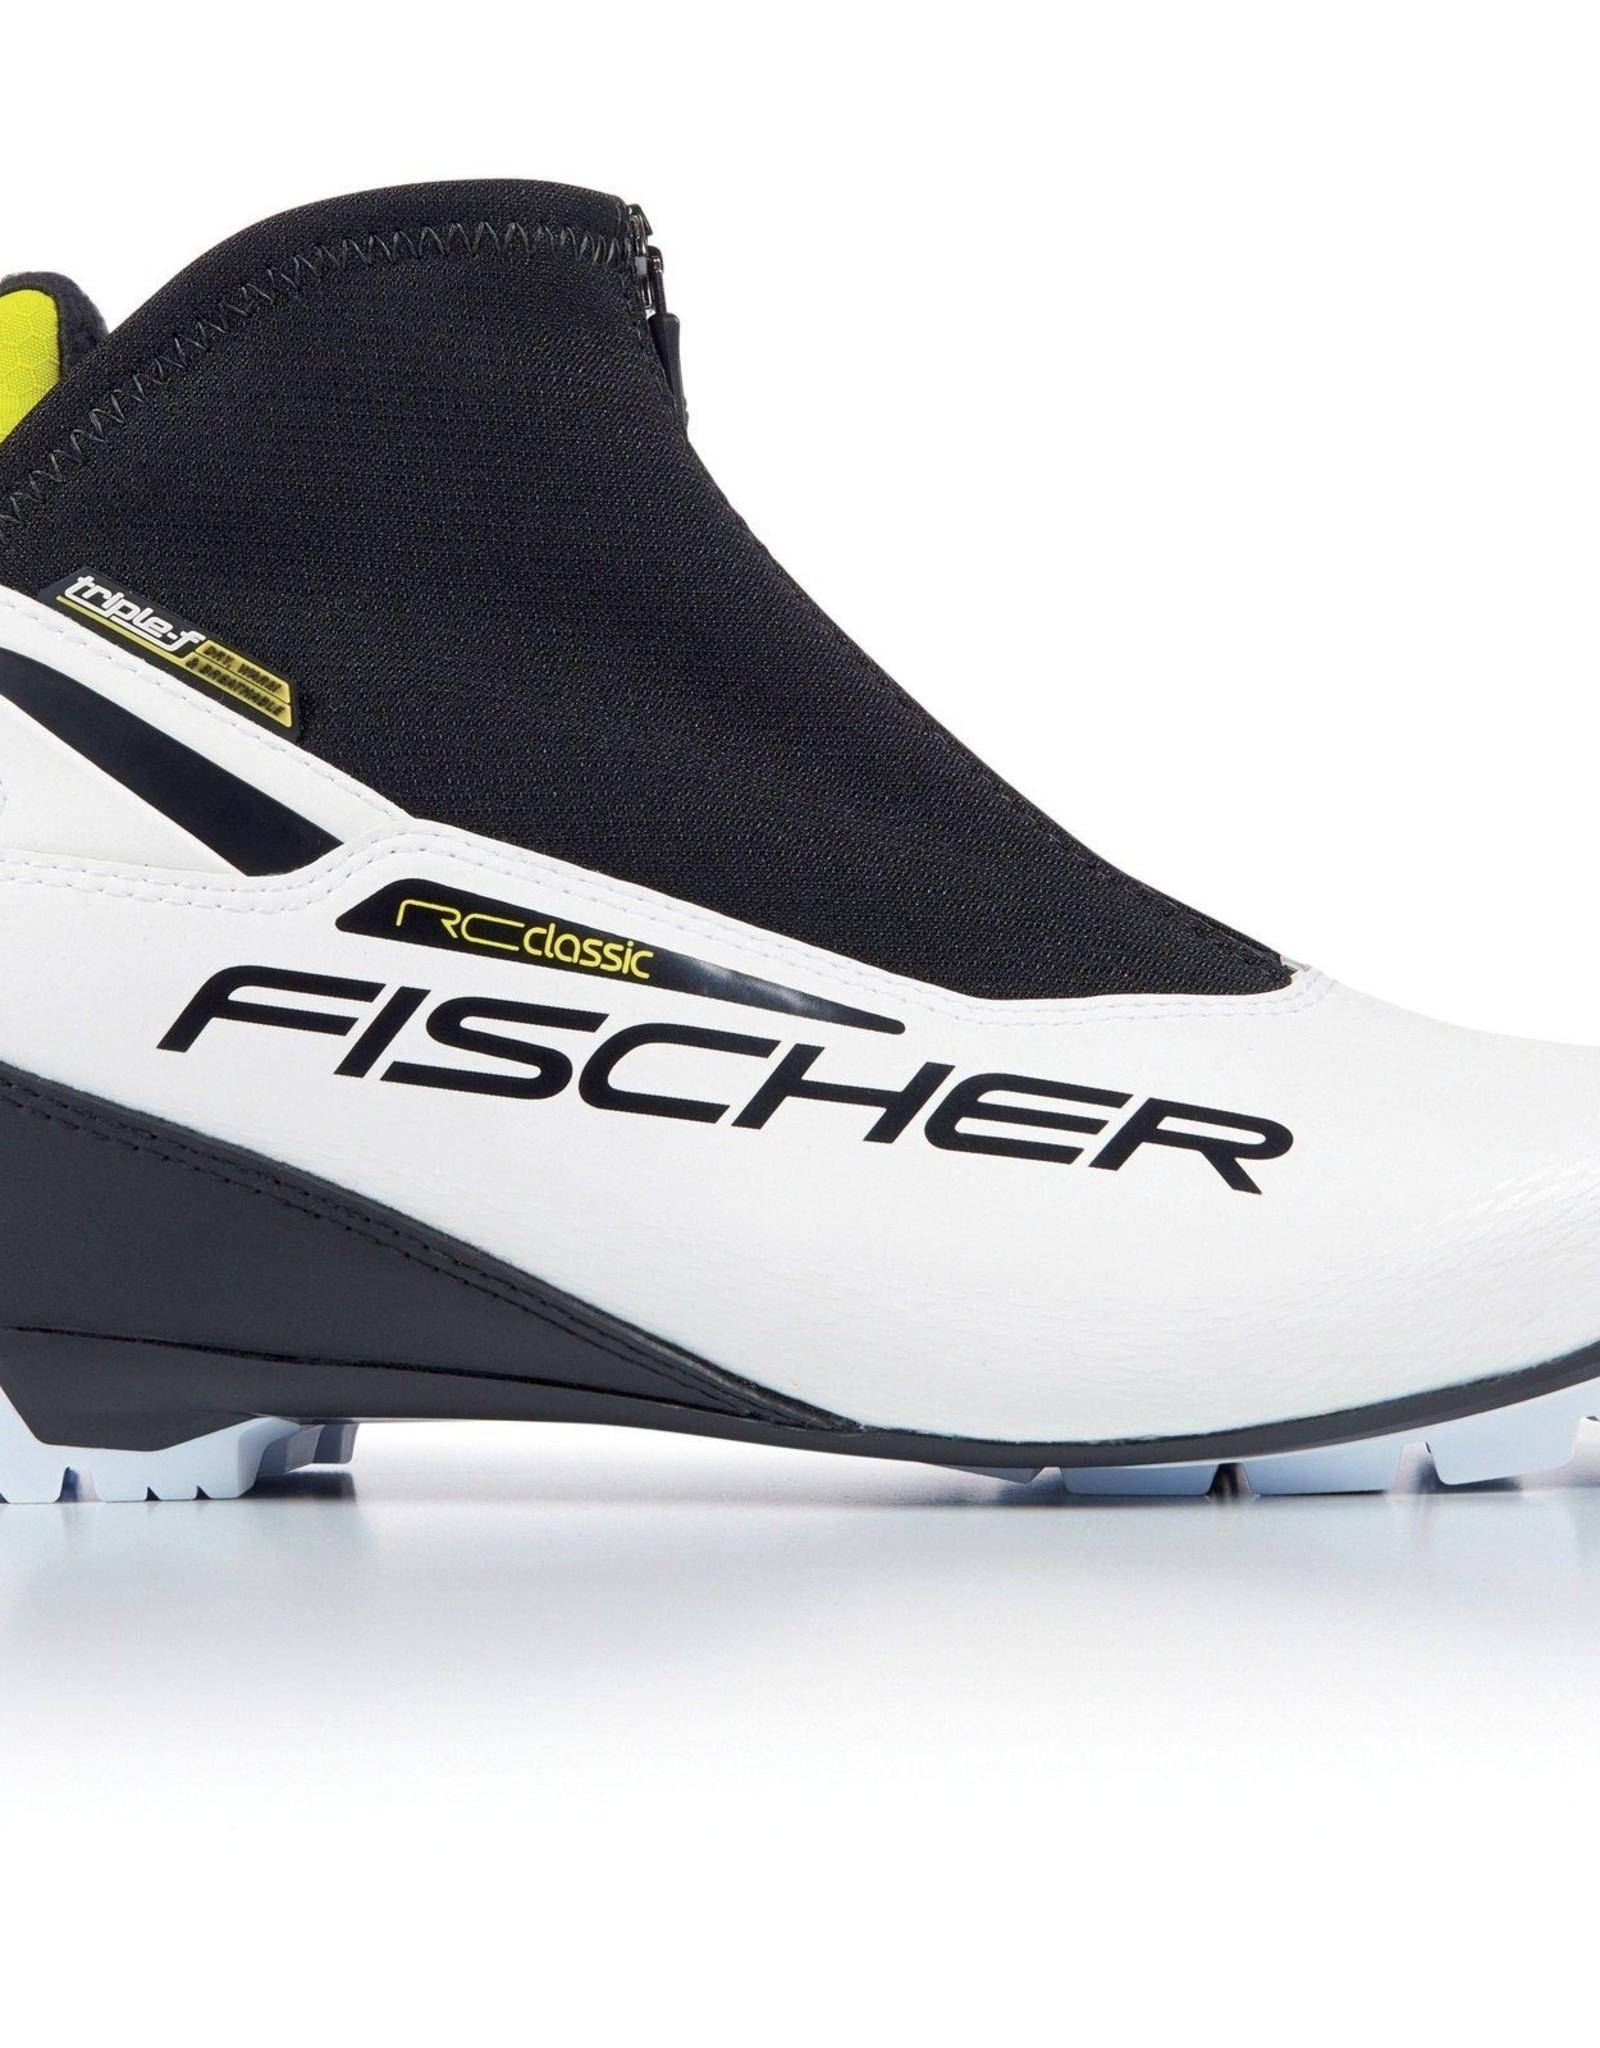 Fischer RC Classic WS Turnamic